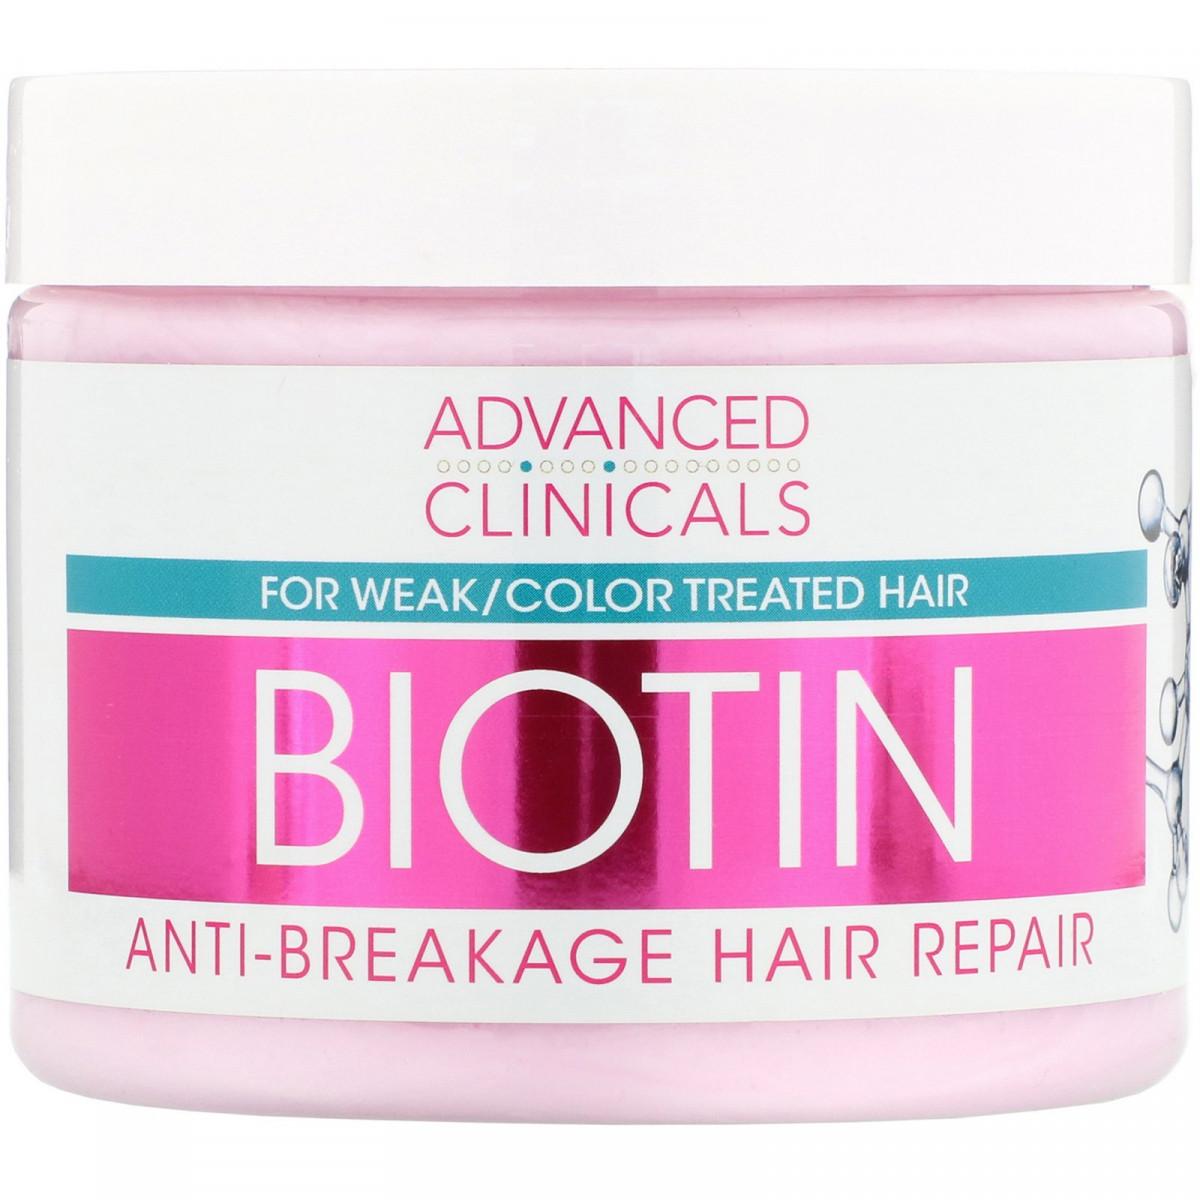 Биотин, восстанавливающий, для волос, Advanced Clinicals, 355 мл